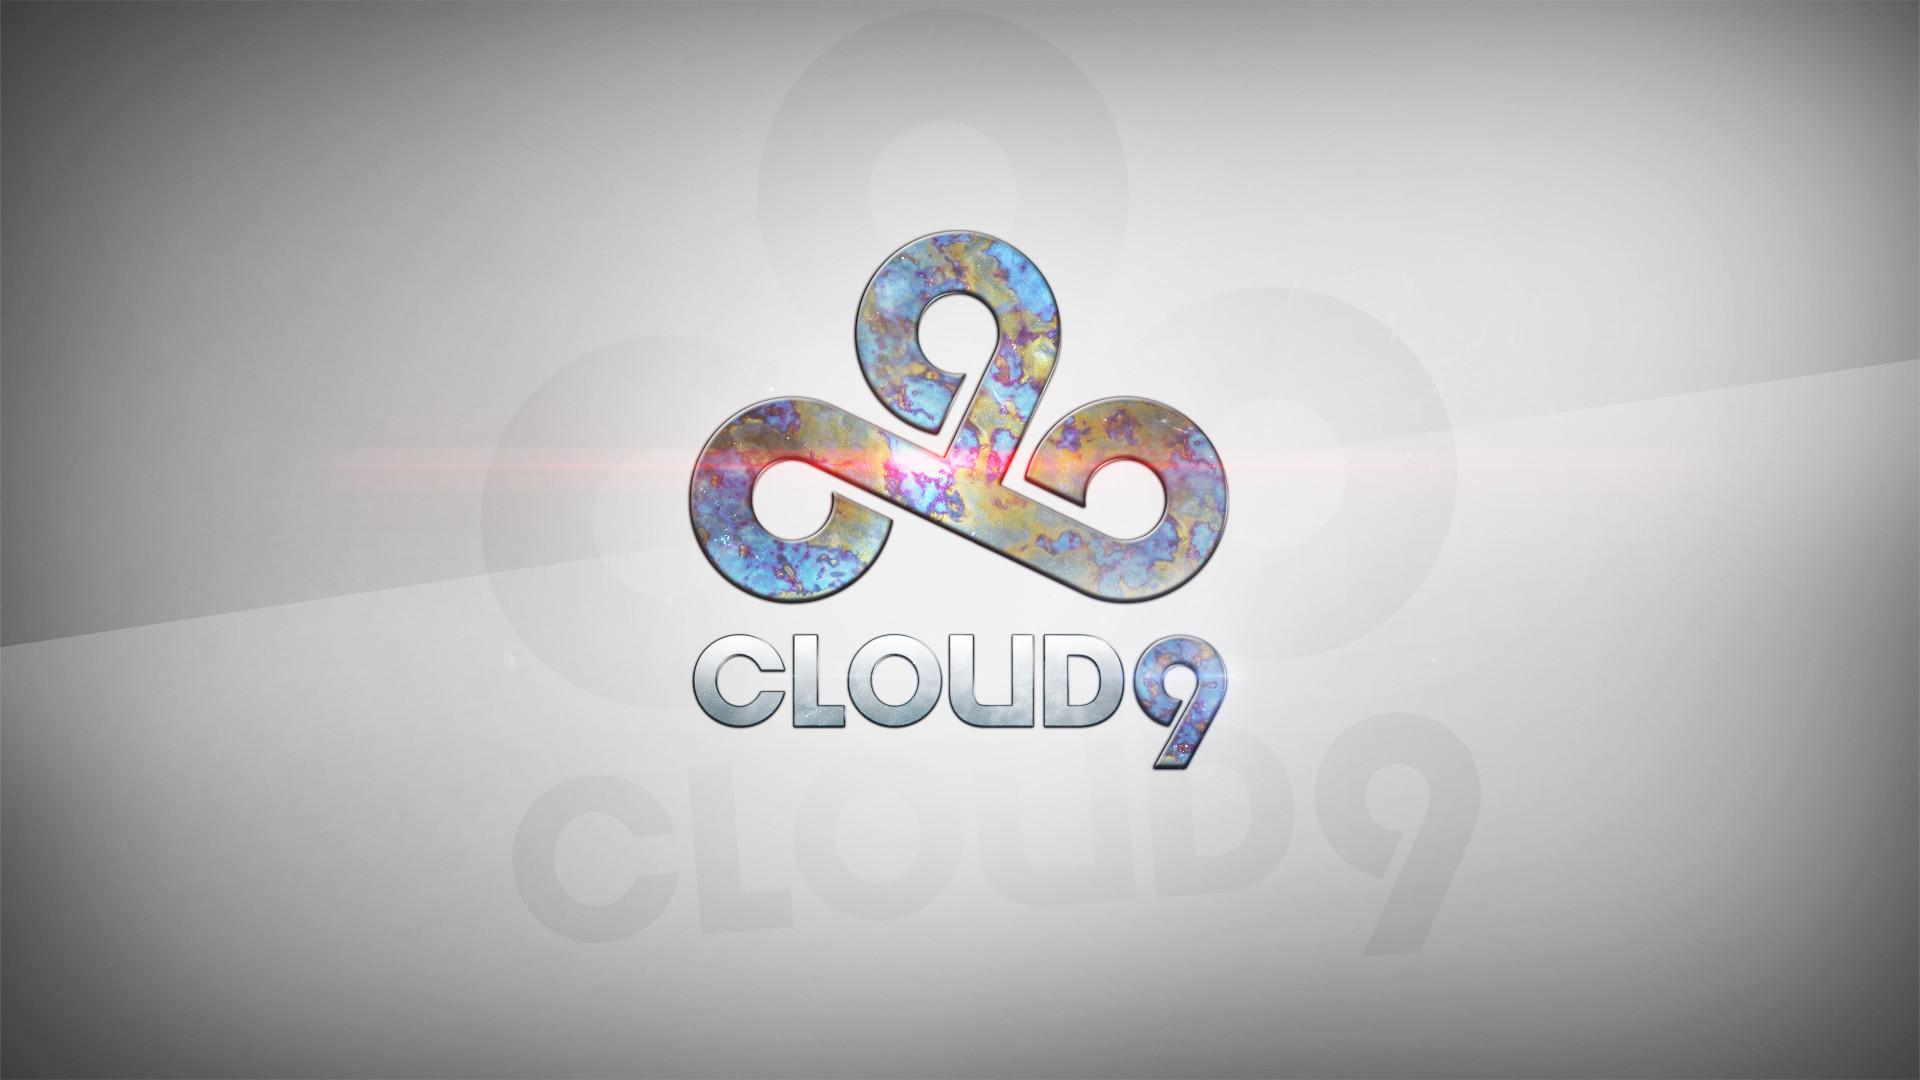 Cloud 9 CS:GO wallpaper (case hardened)